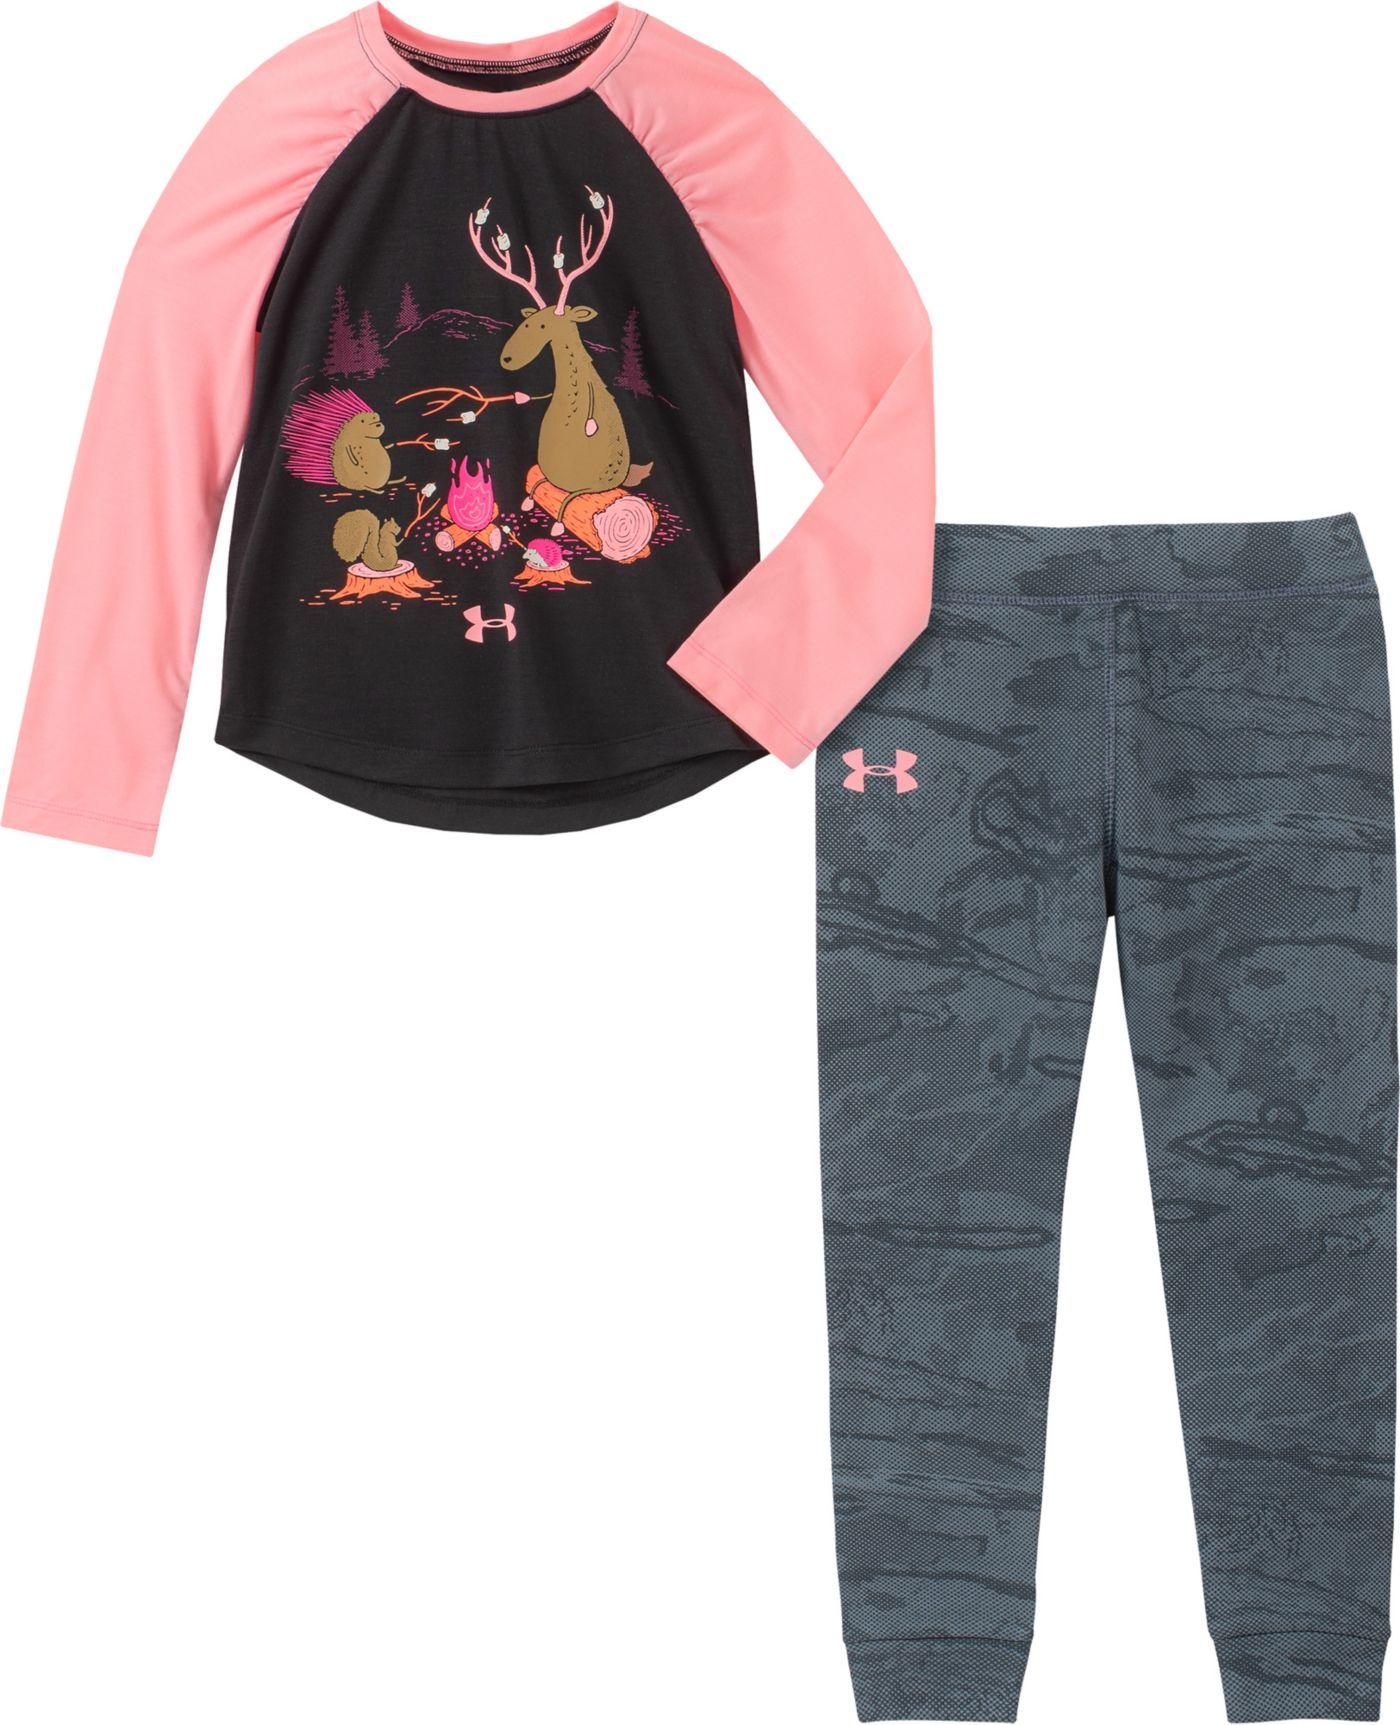 Under Armour Toddler Girls' Camp Fire Friends T-Shirt and Pants Set